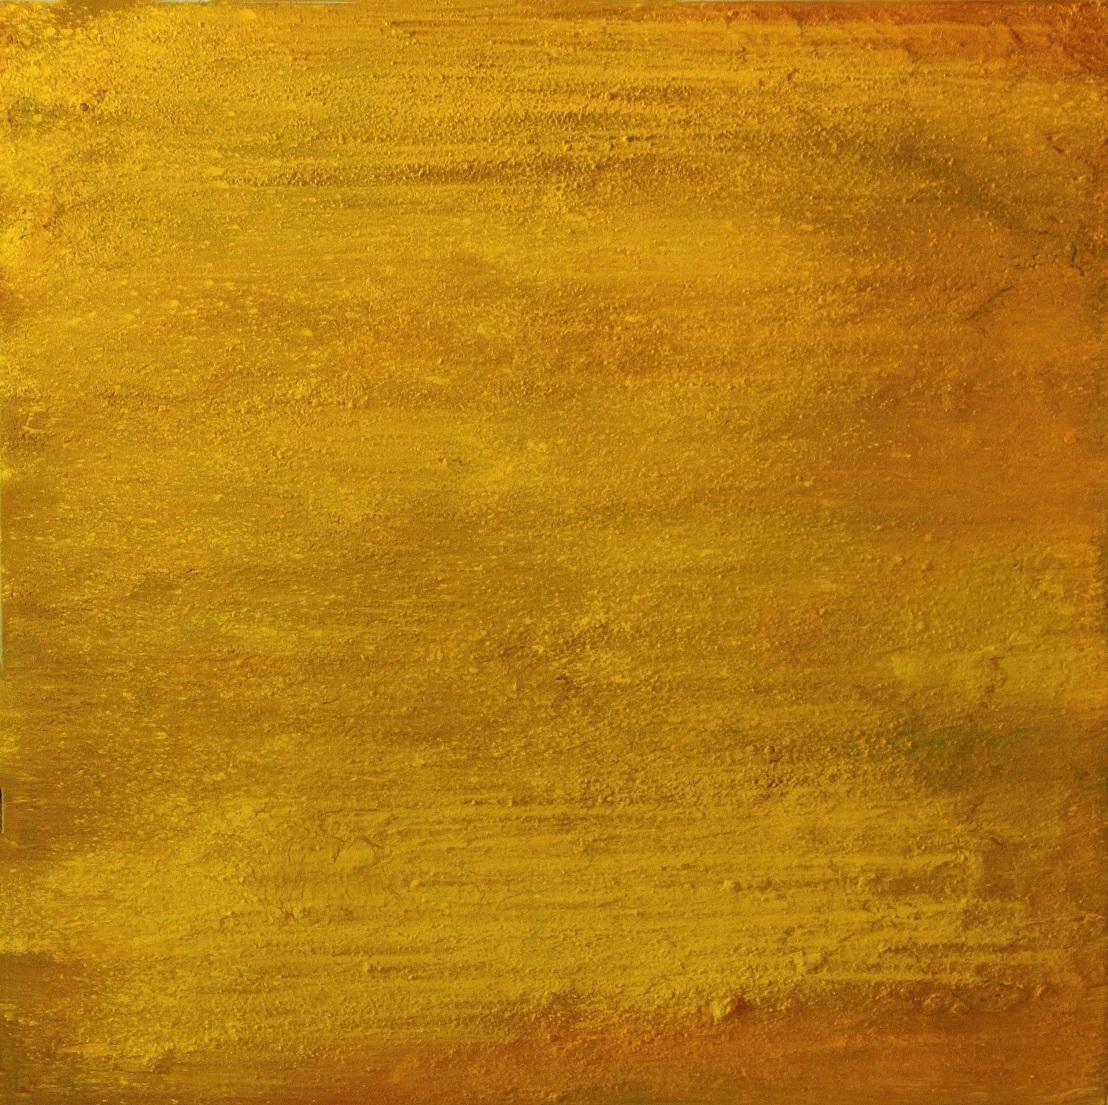 Alberto Reguera 100 x 100 x 13 cm técmnica mixtaJPG (2)